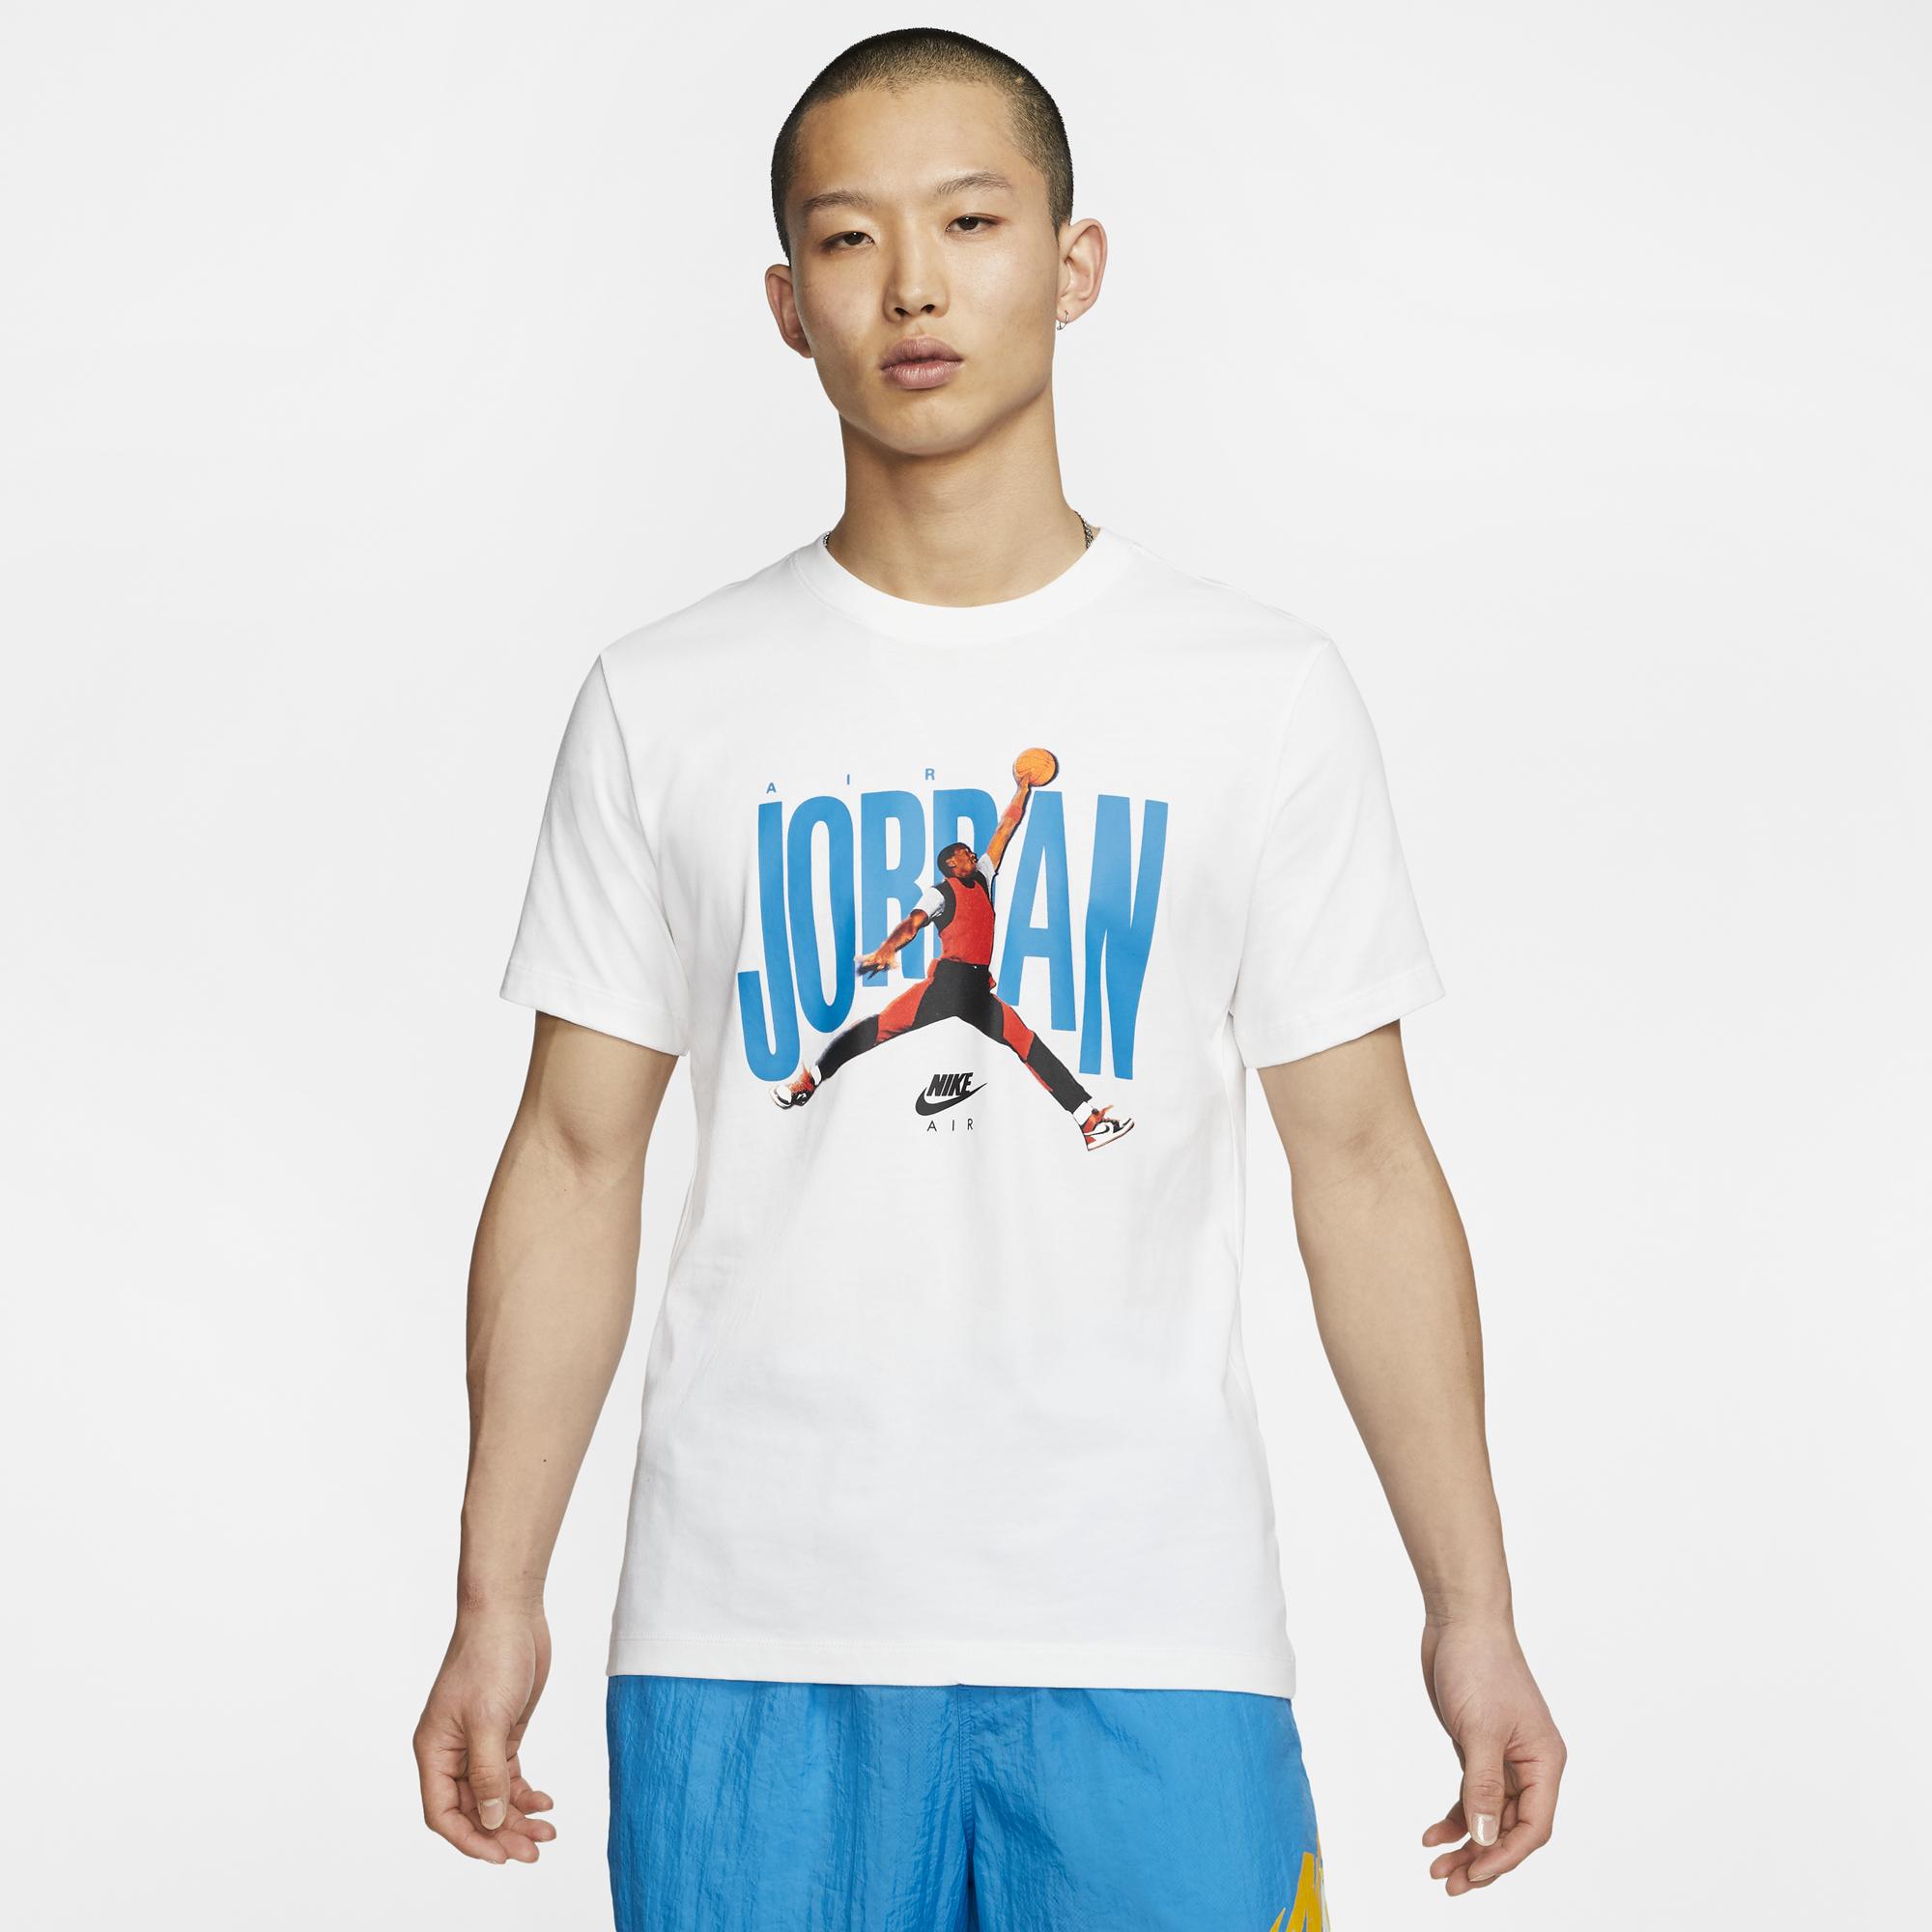 Men's Jordan T-Shirts | Foot Locker